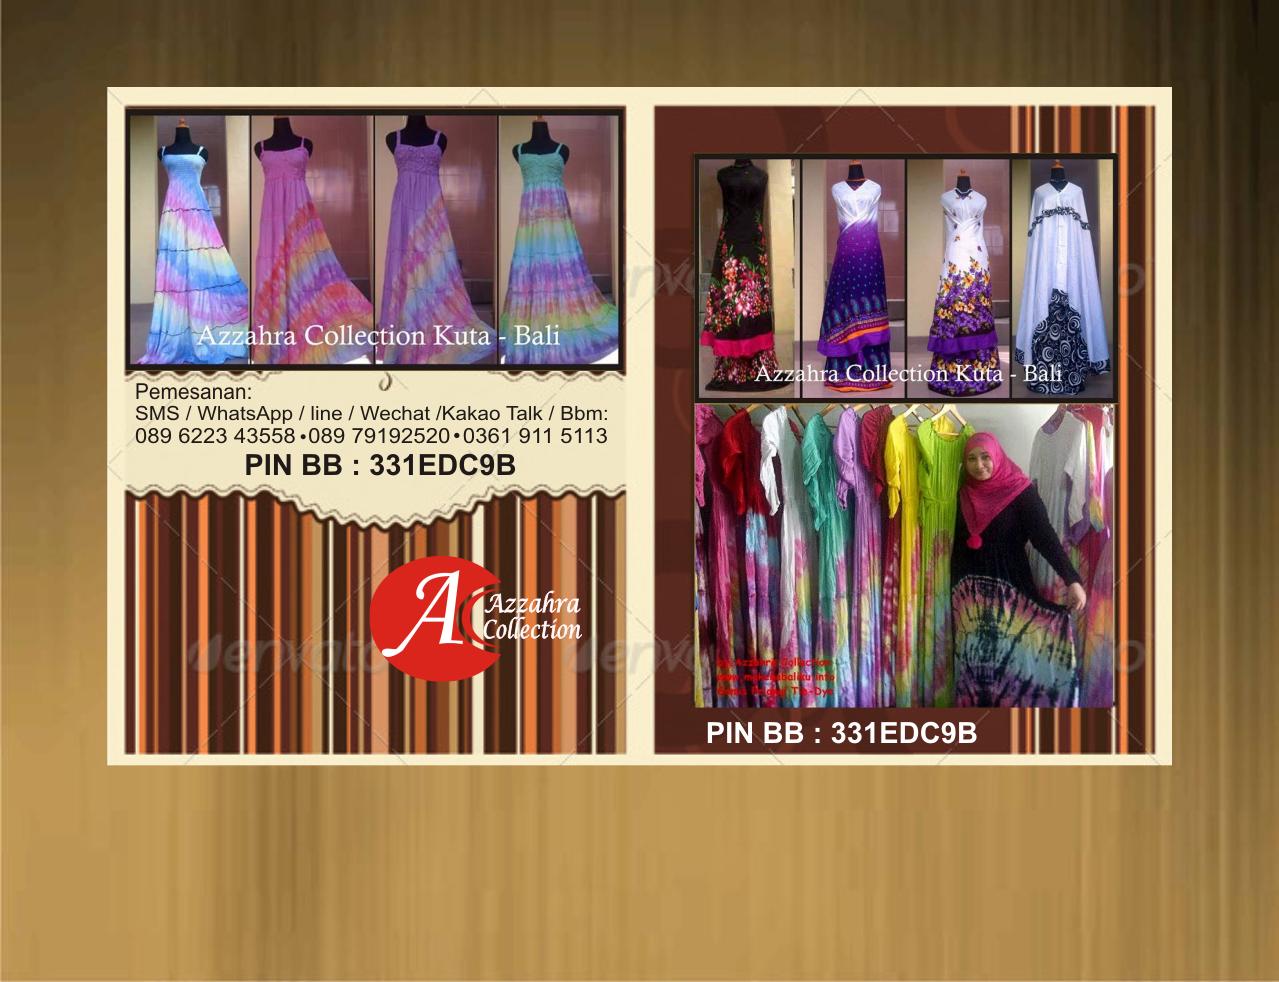 Azzahra Bali Fashion